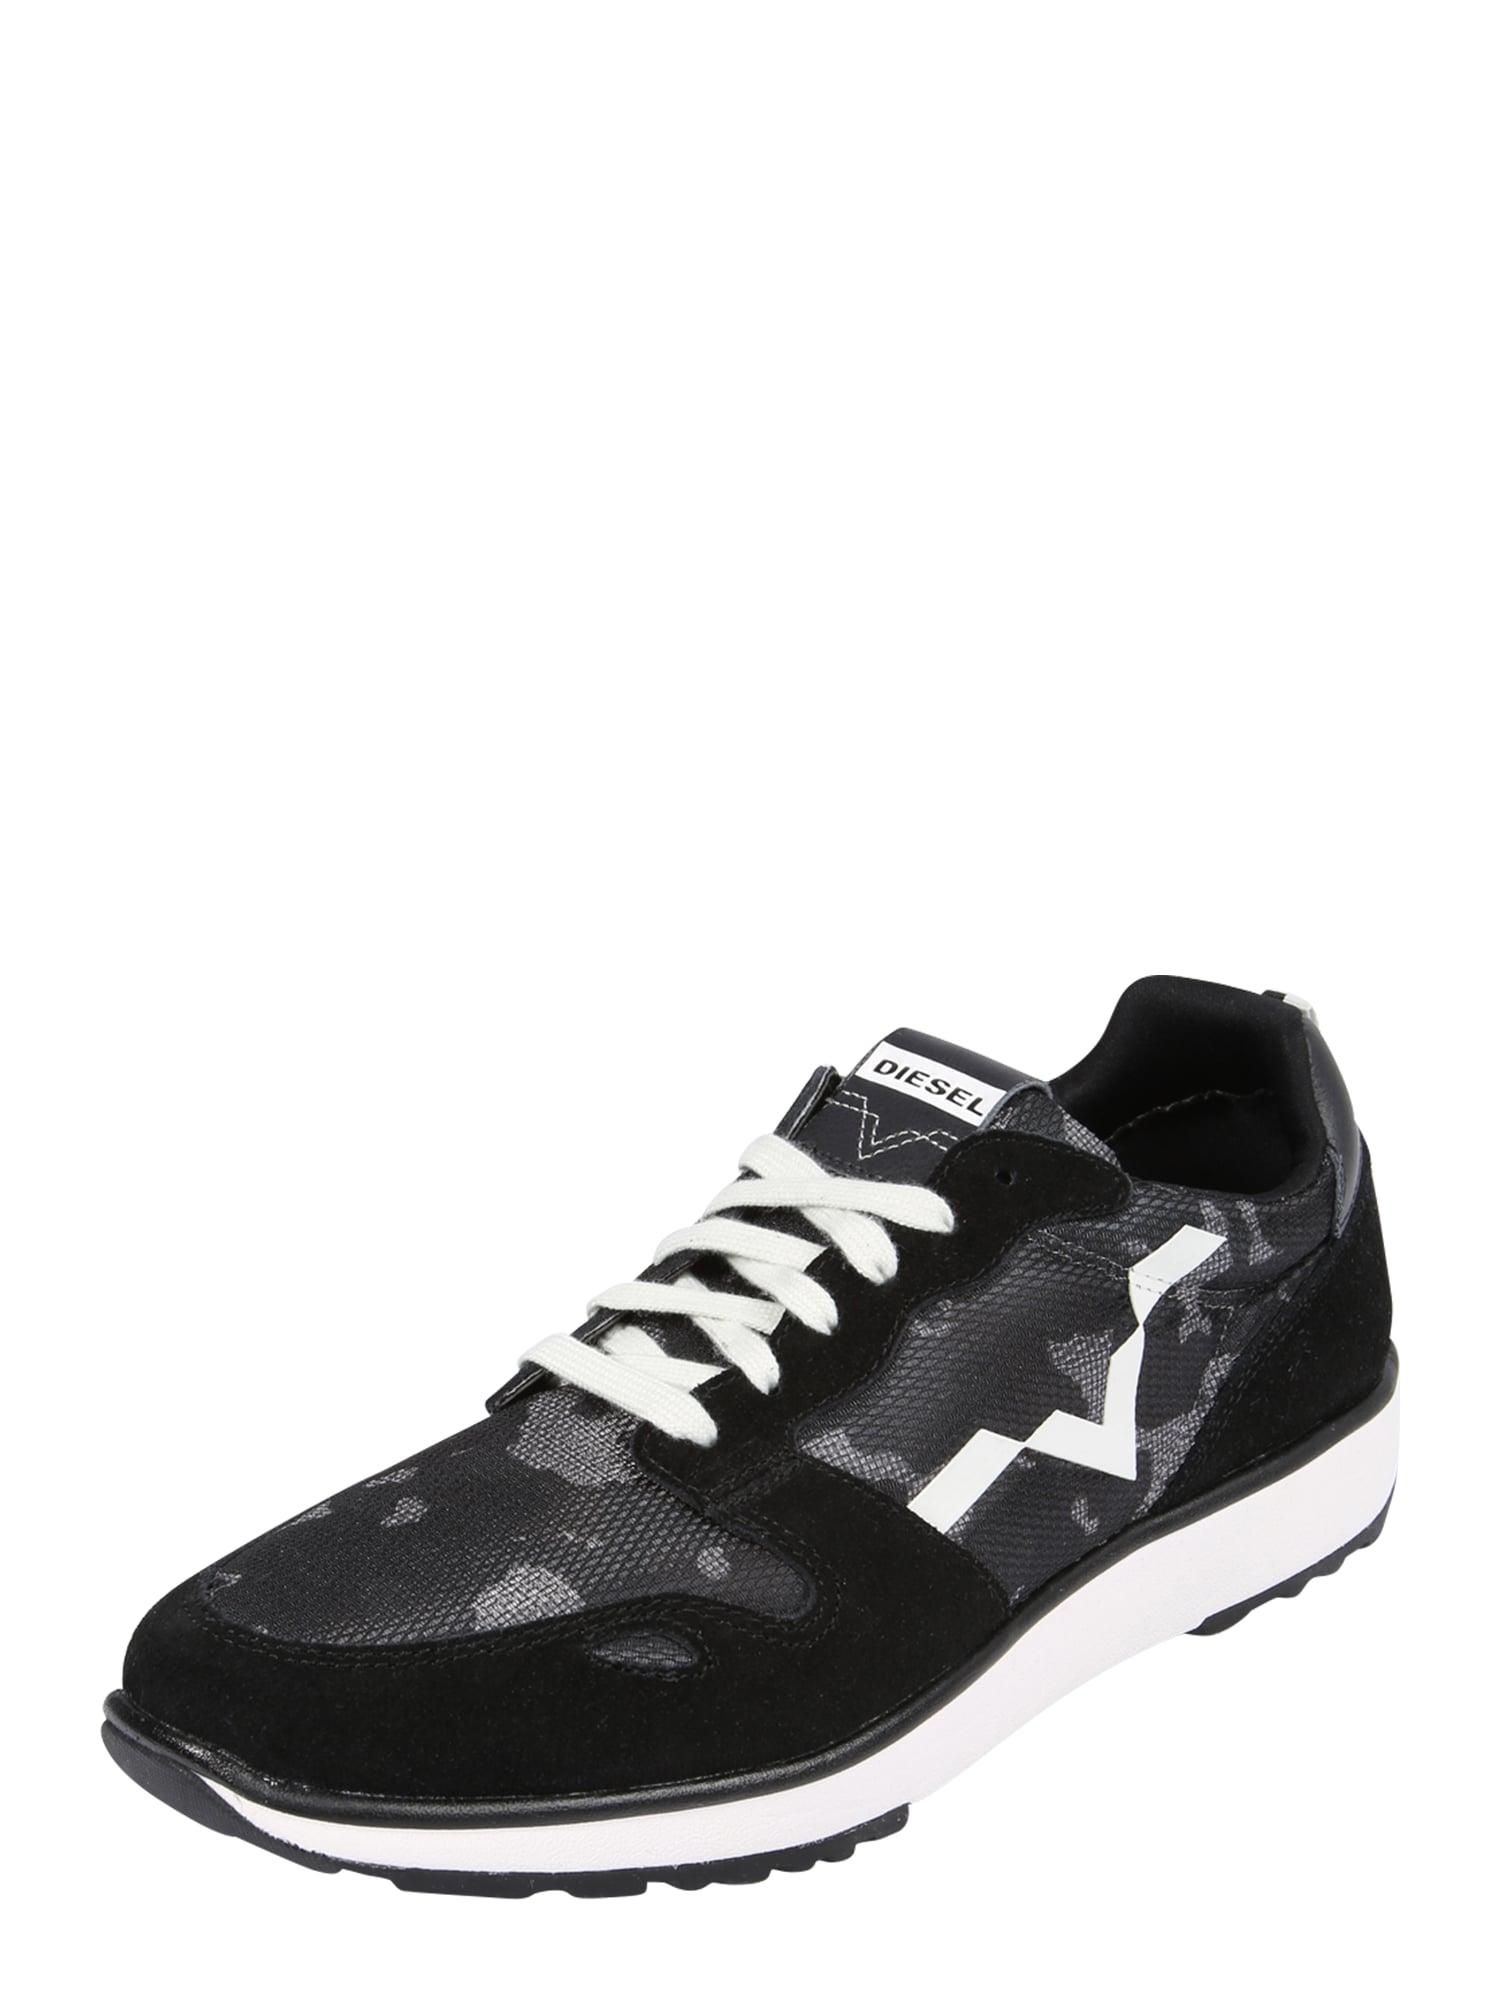 DIESEL Heren Sneakers laag CORTT RV zwart